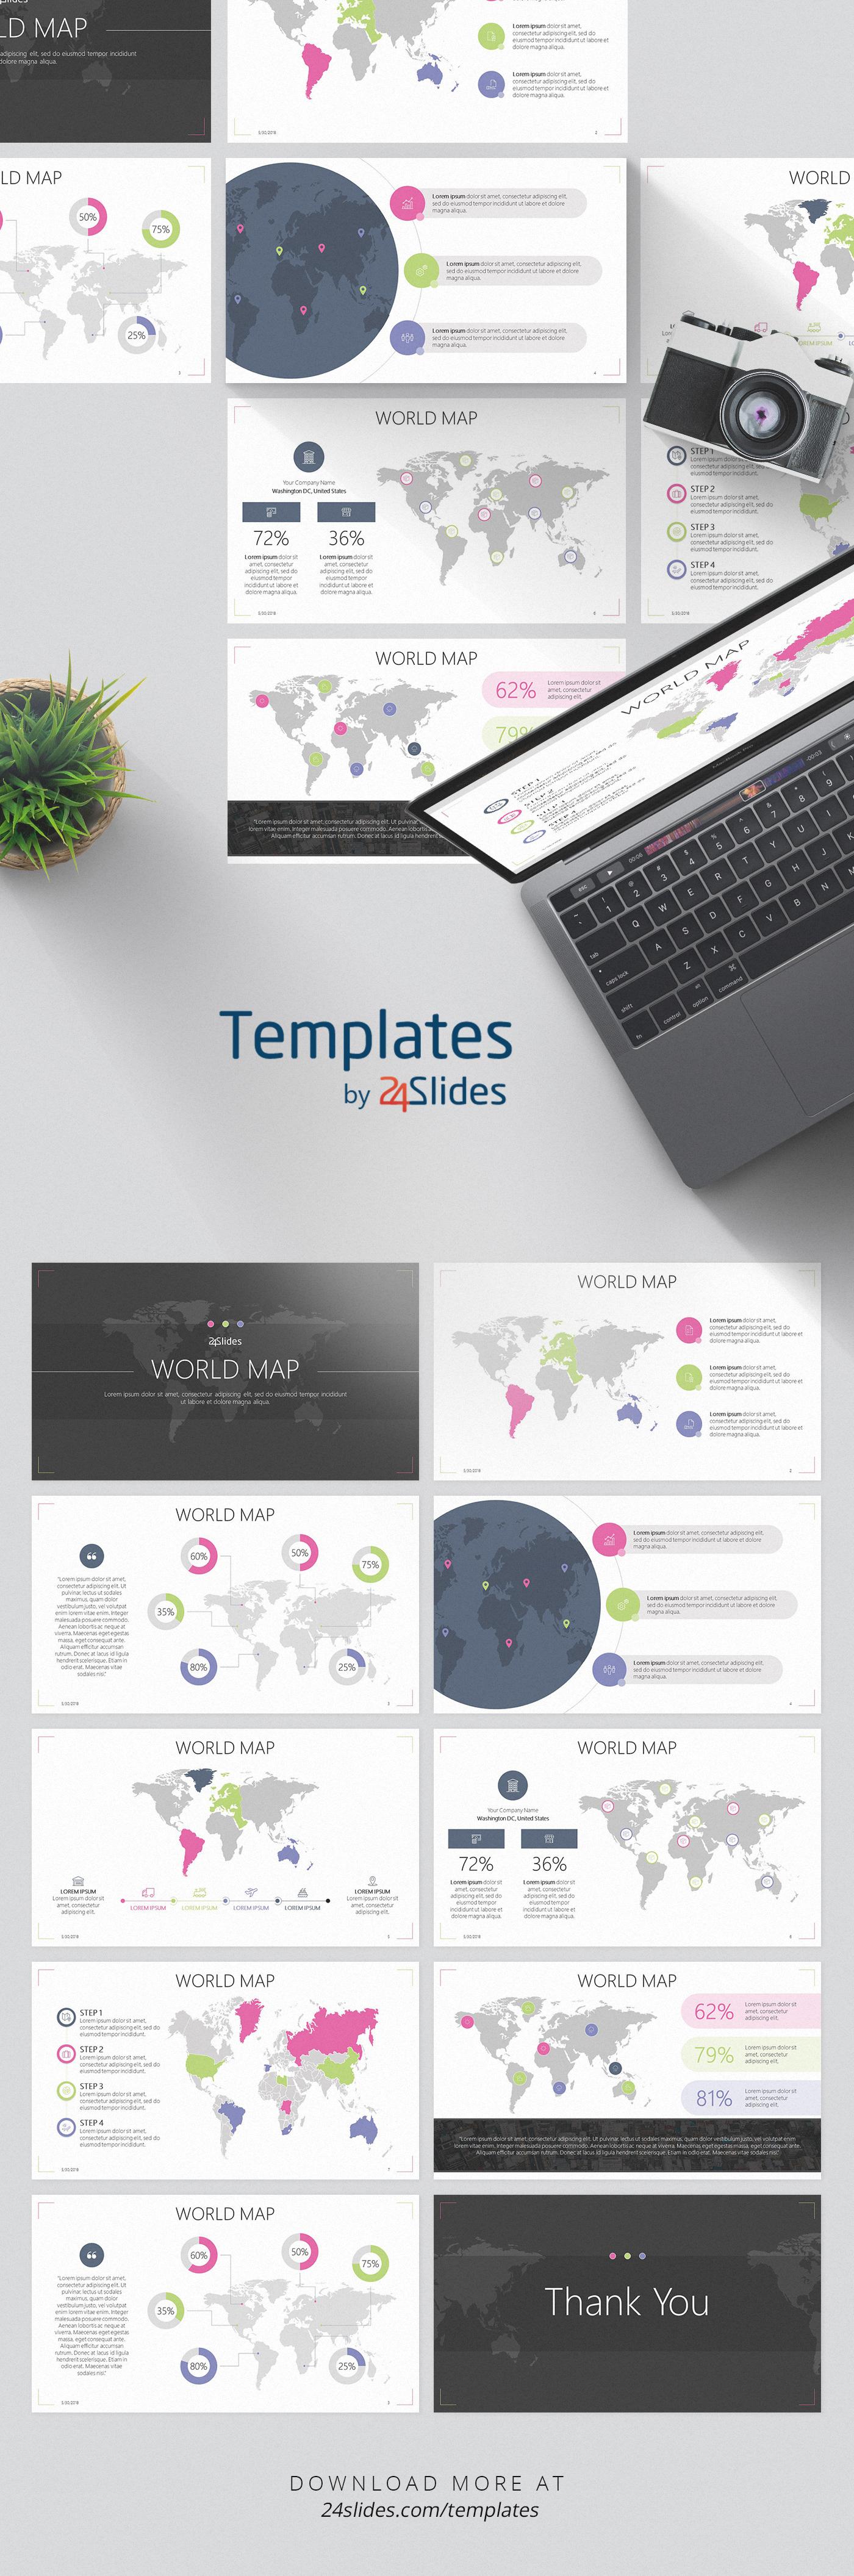 download Business presentation Presentation templates free template presentation